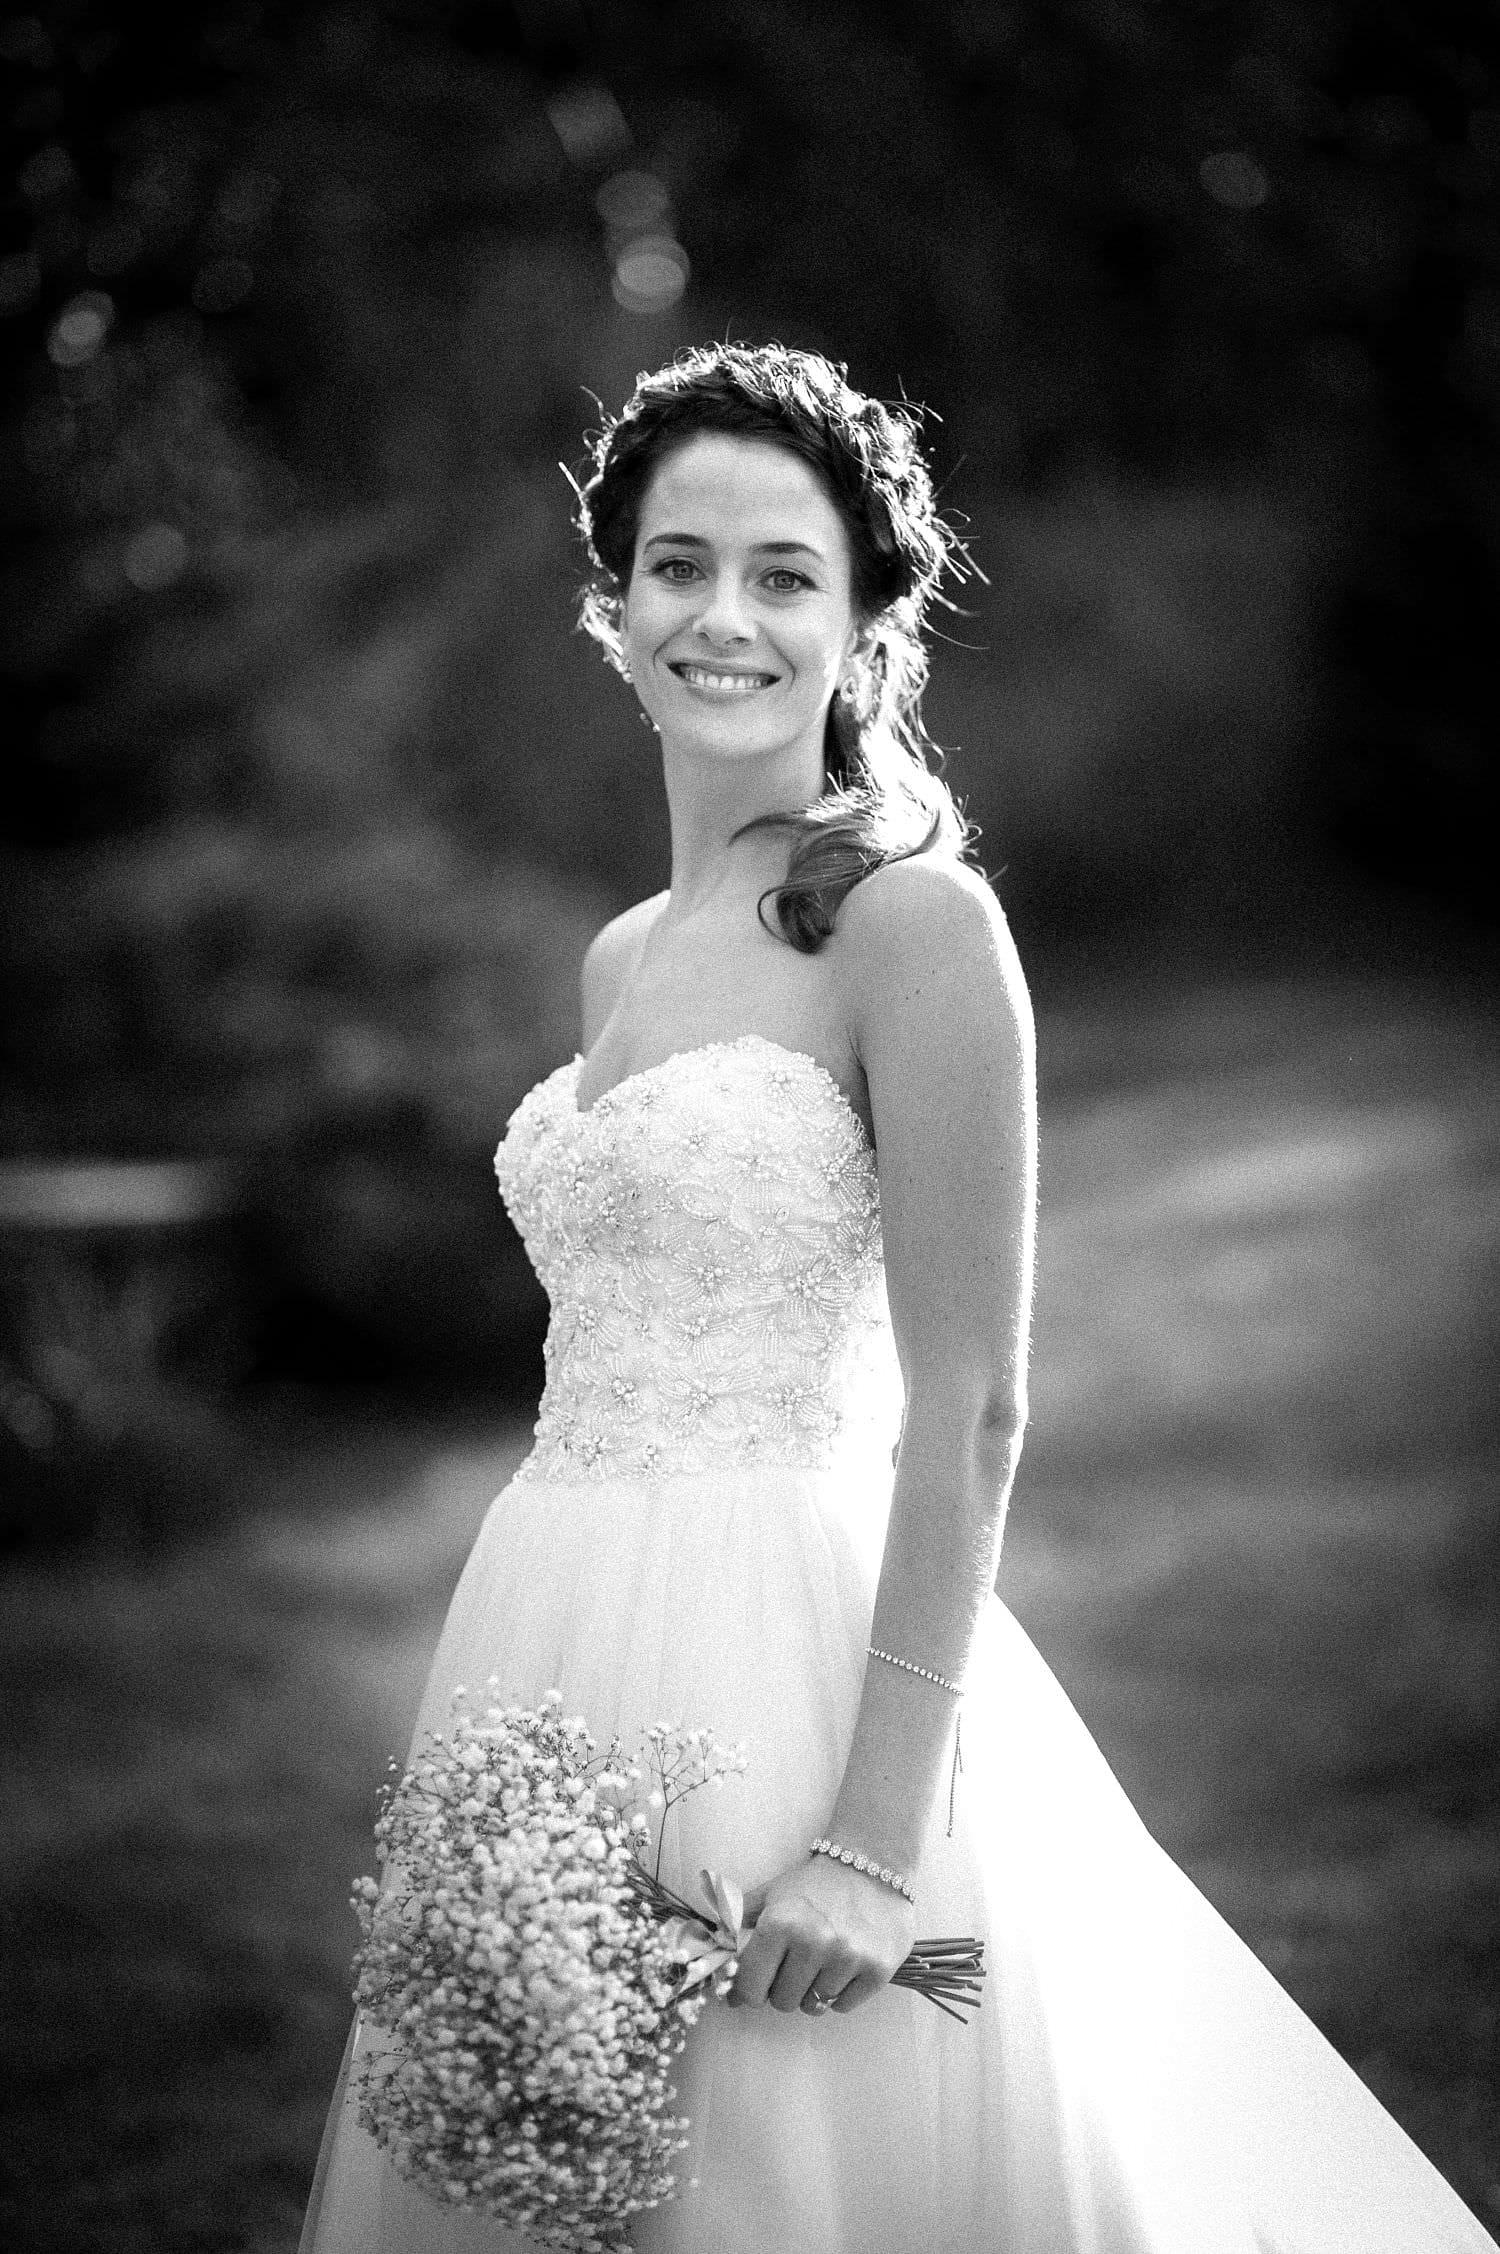 Weddings at Danesfield House 7